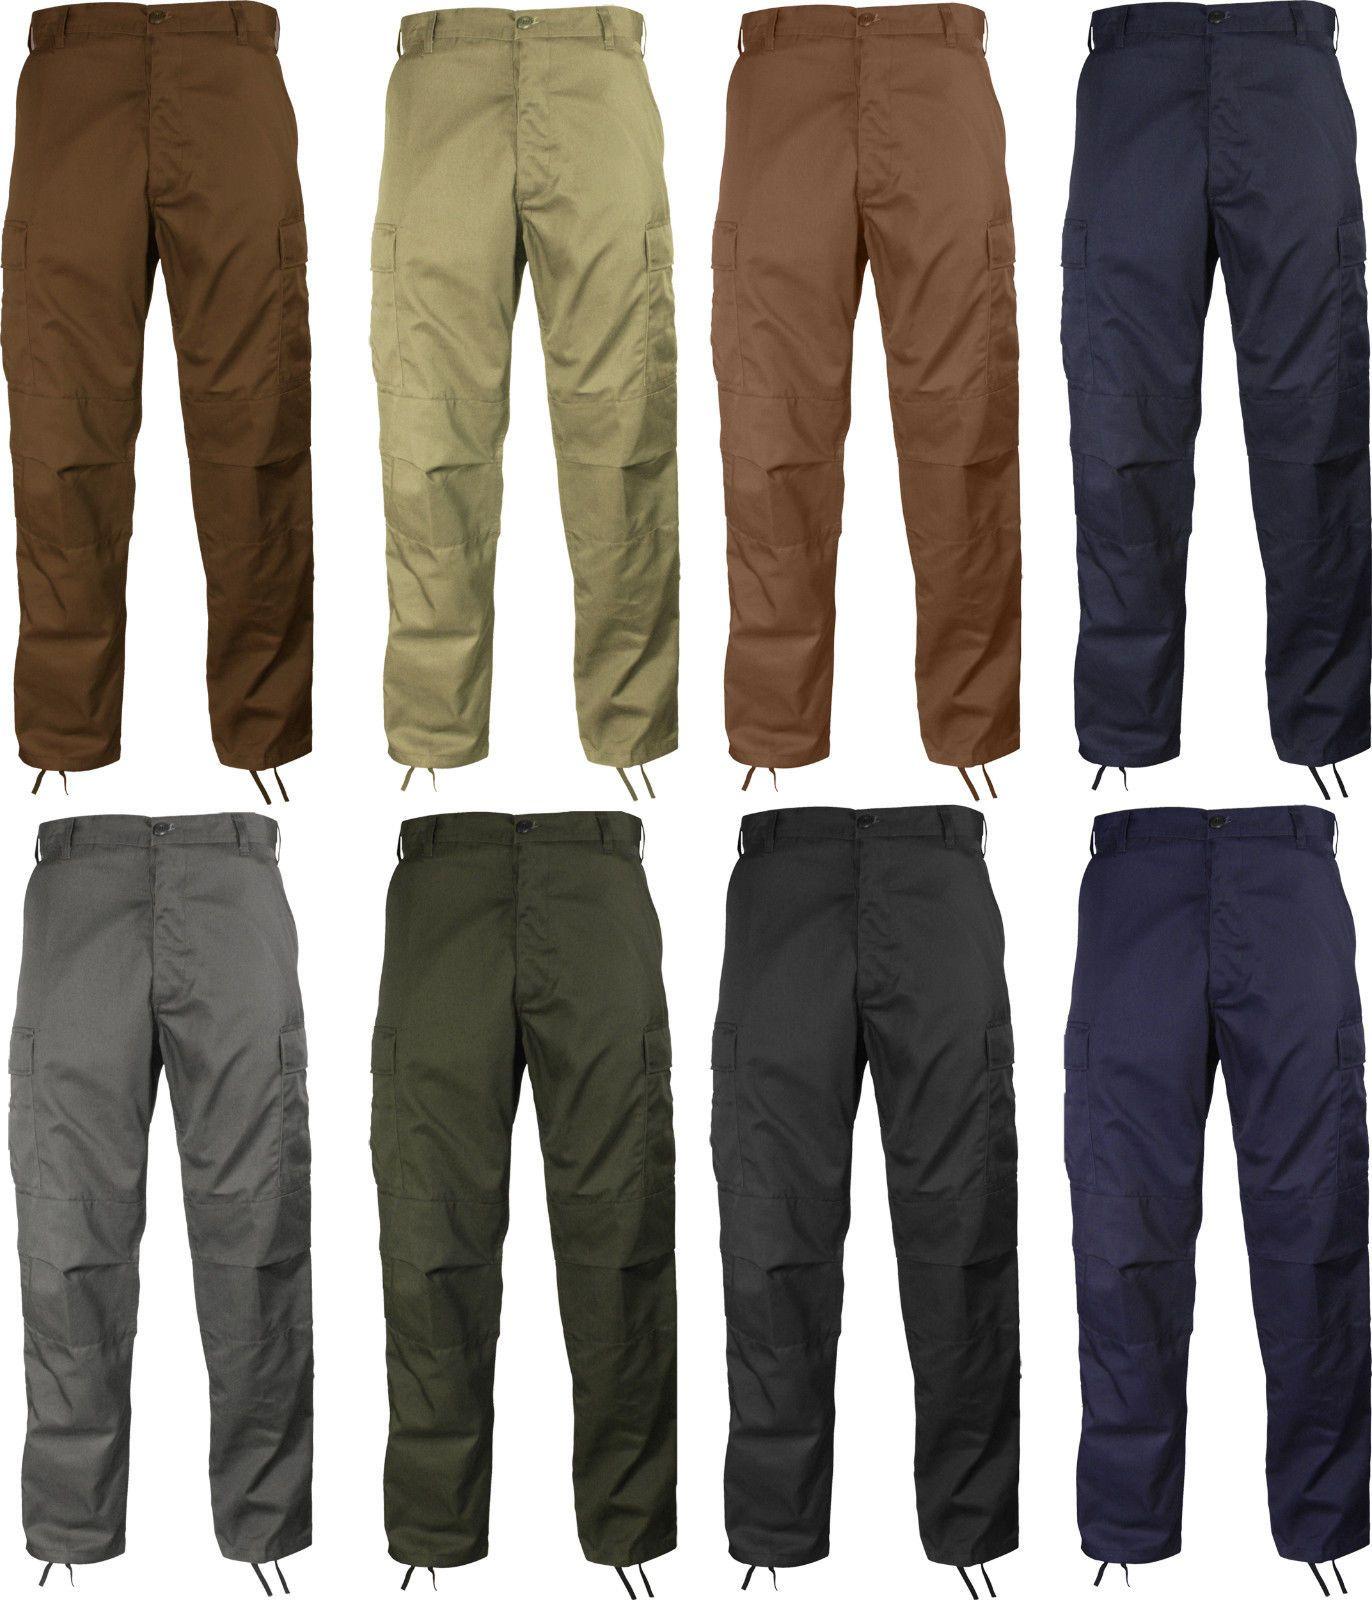 Army Universe Pants  ebay  Clothing 47f4acfb7